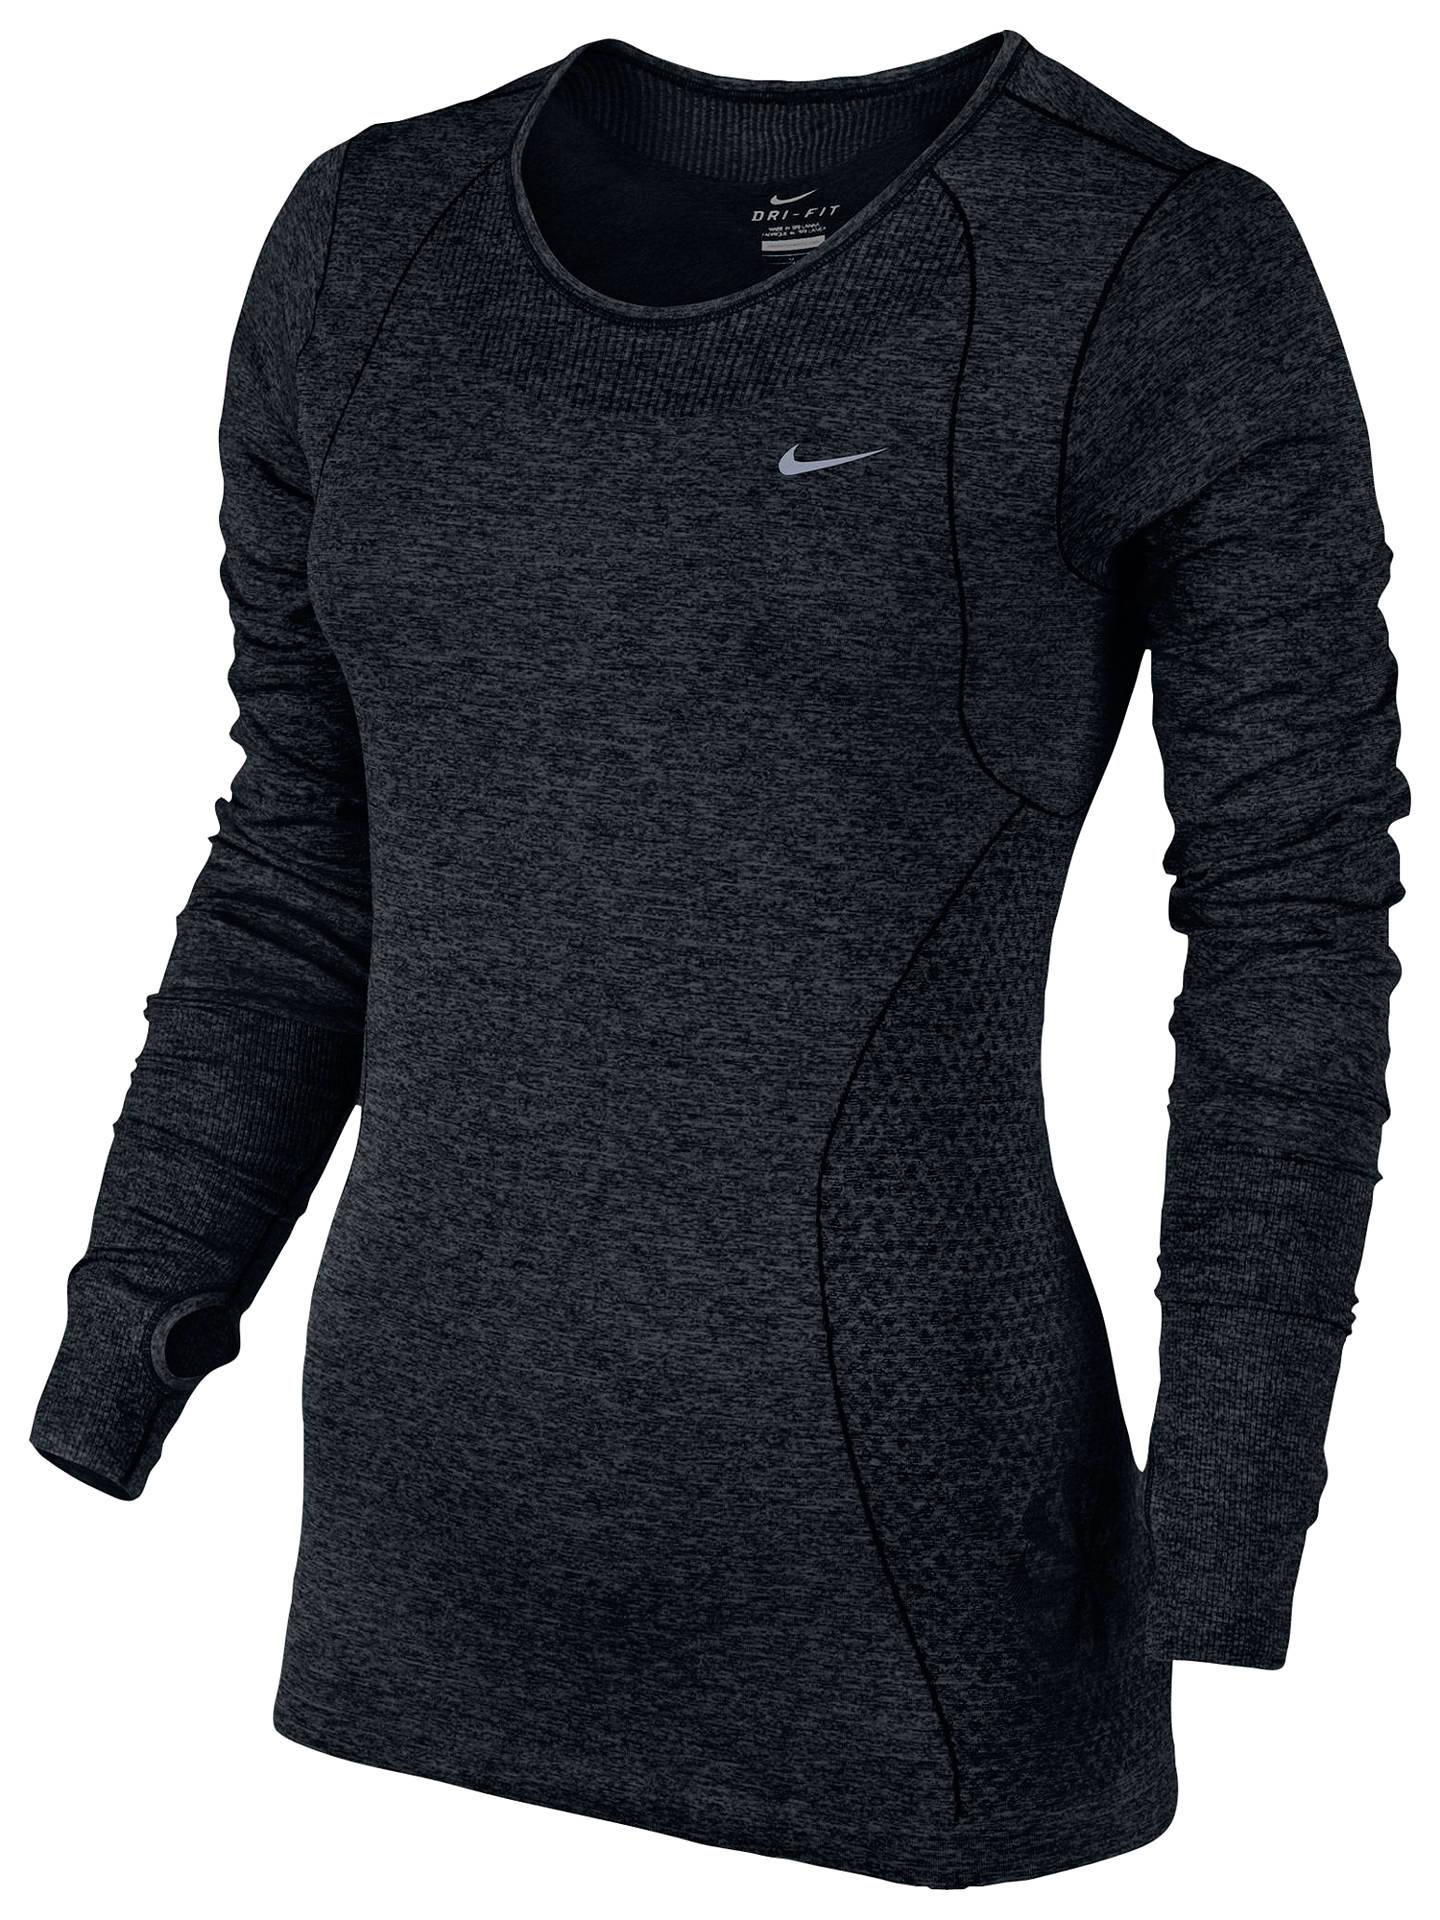 5afe3445ce45 Buy Nike Dri-FIT Knit Long Sleeve Running Shirt